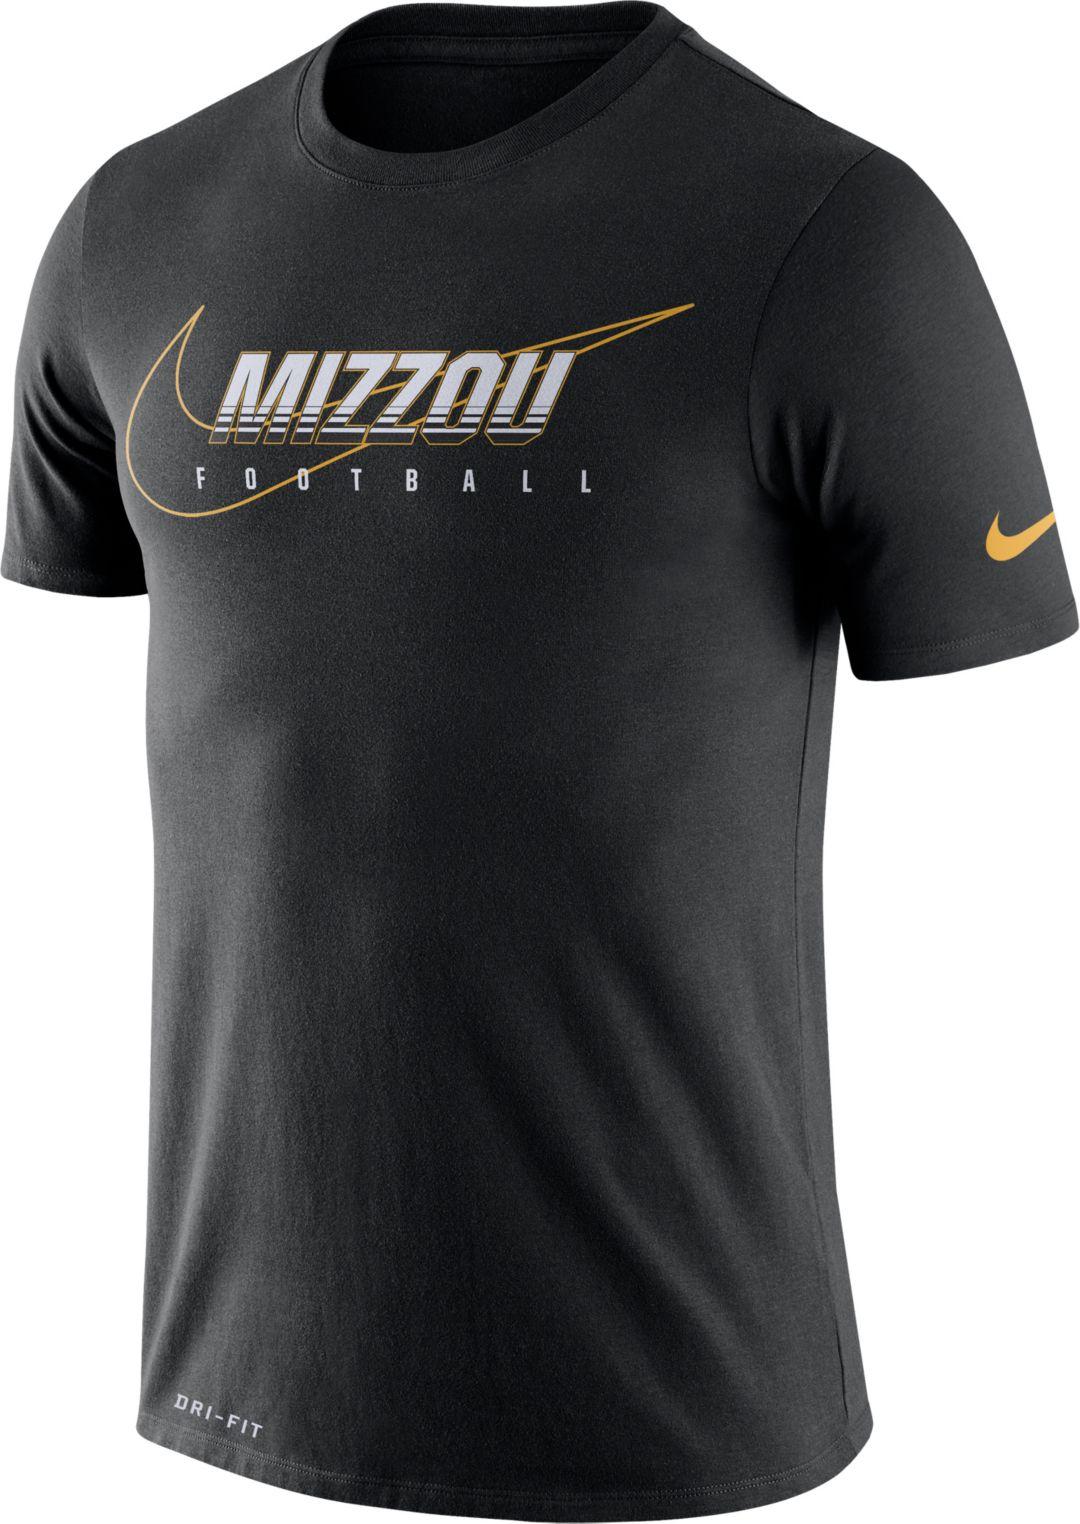 save off 0a89e 09298 Nike Men's Missouri Tigers Football Dri-FIT Cotton Facility Black T-Shirt